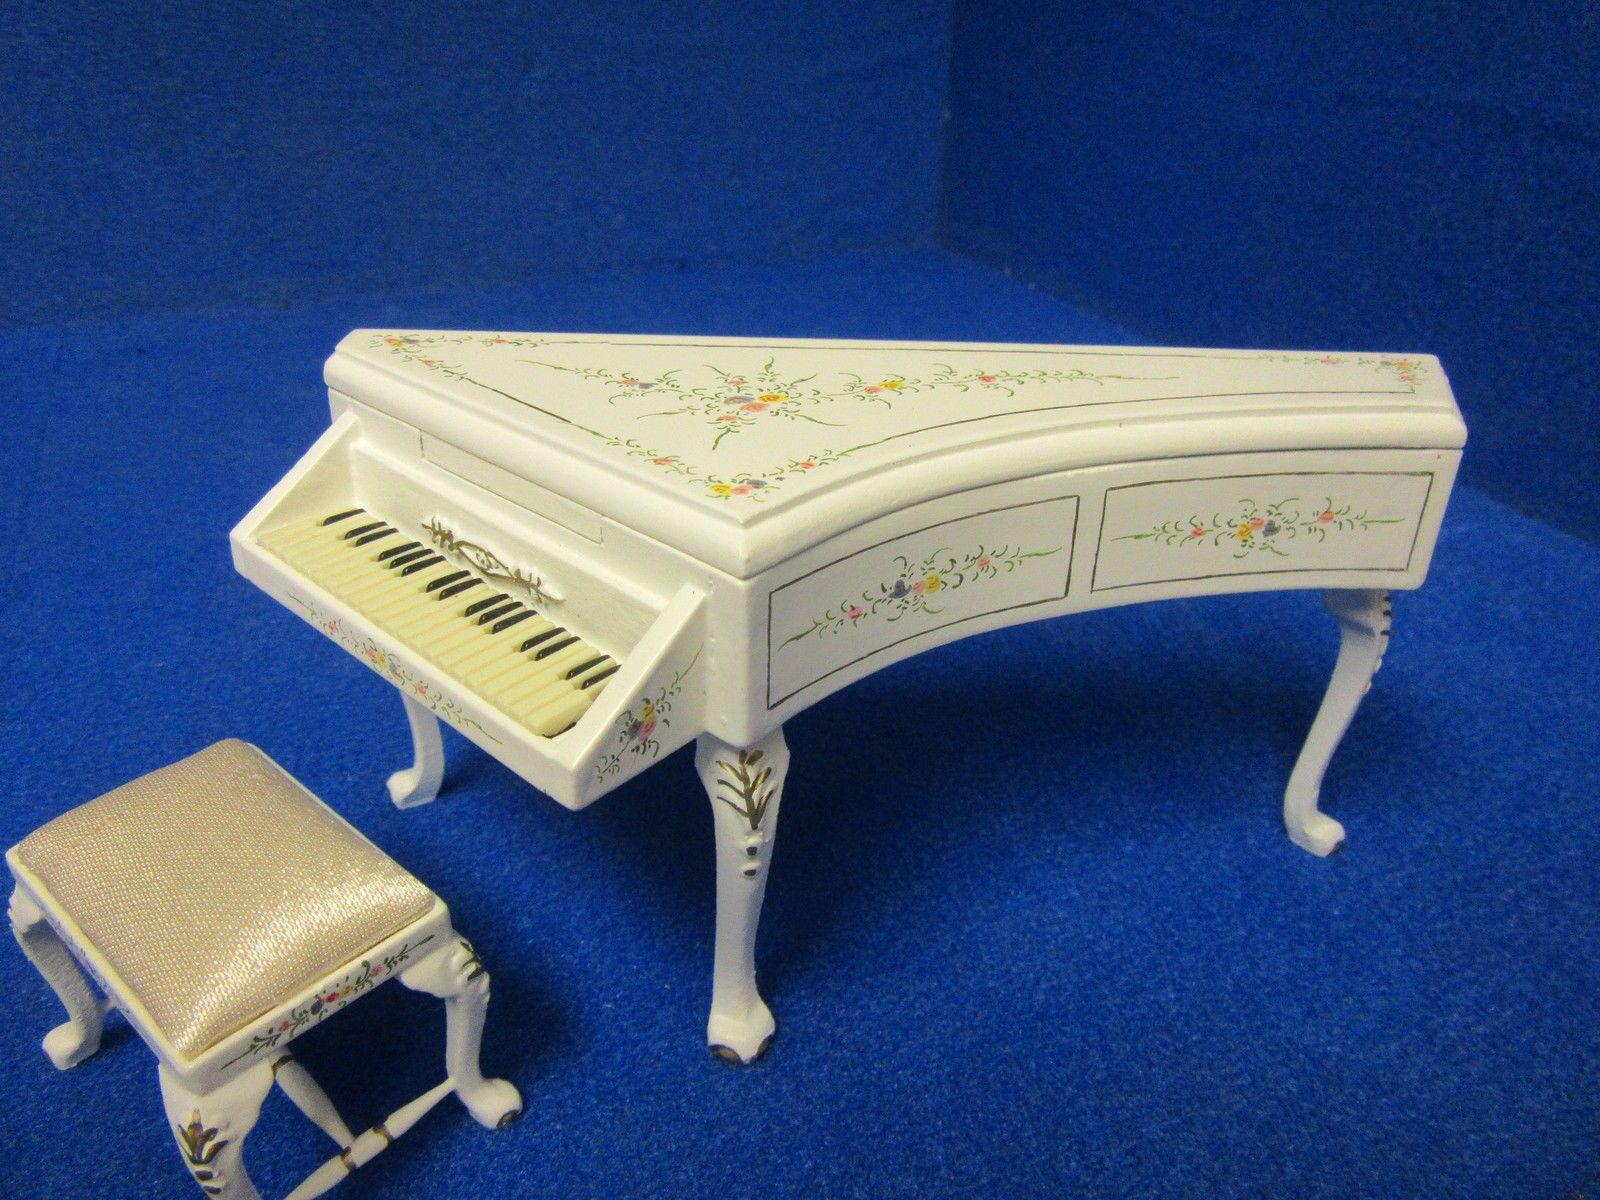 Quality 12th Dolls House Furniture Harpsichord And Stool JiaYi 046 01 2